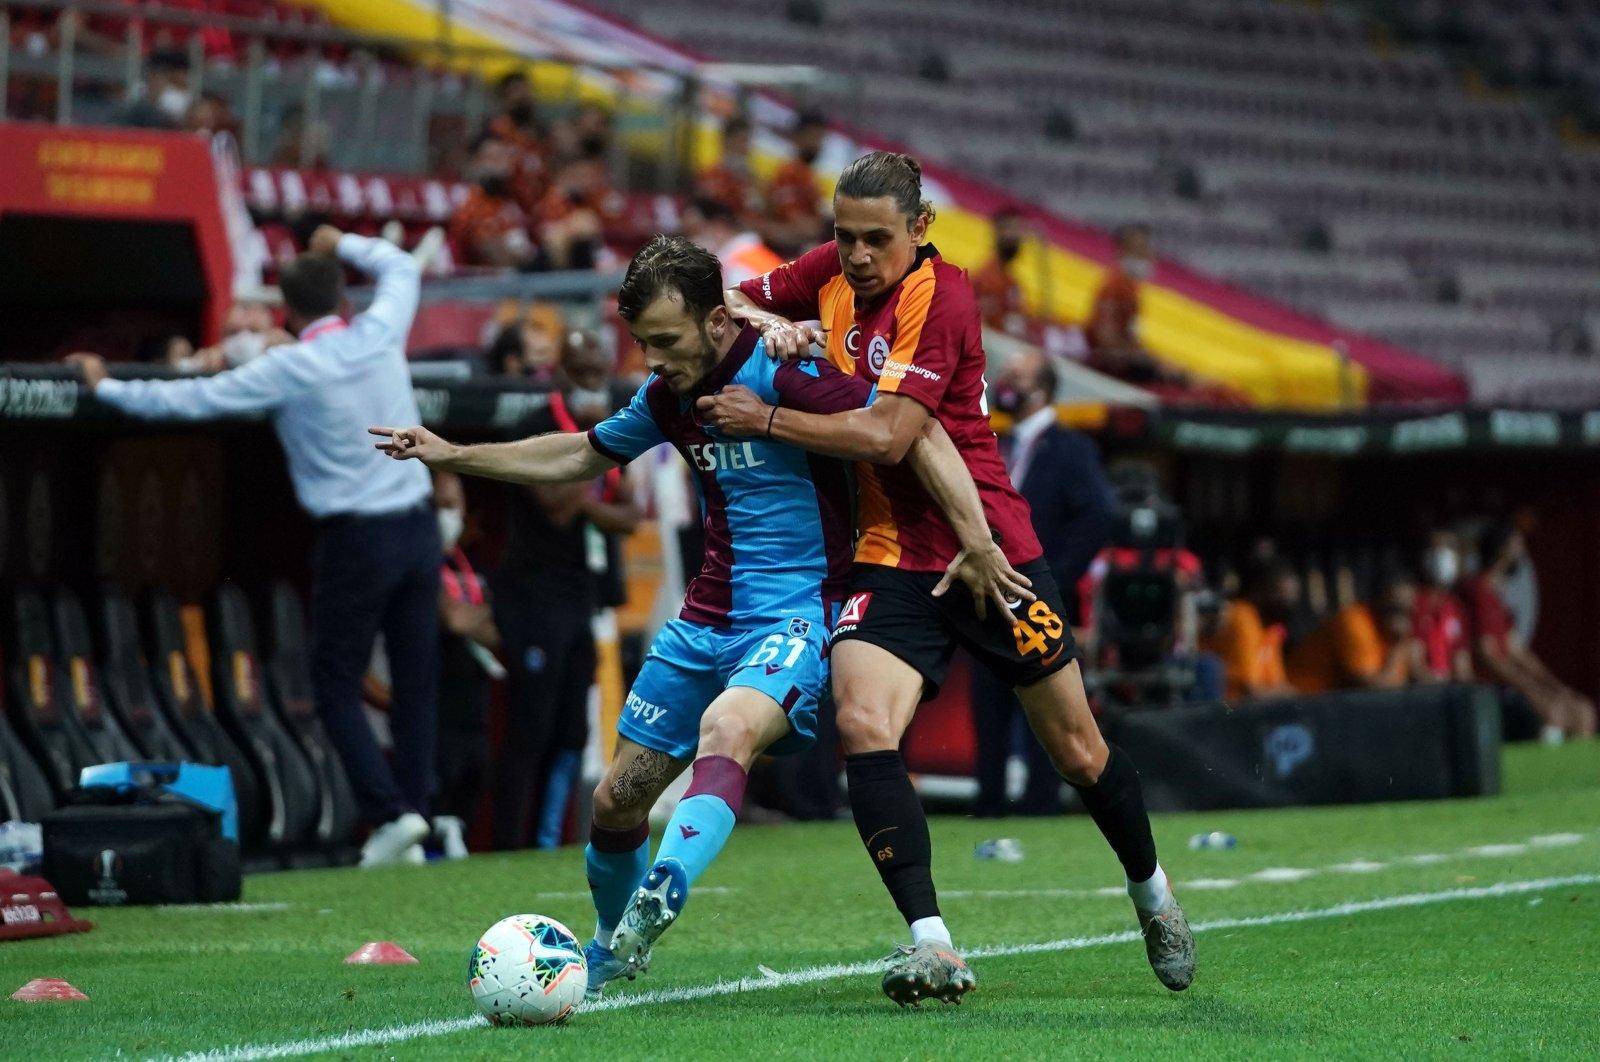 Trabzonspor's Abdülkadir Parmak and Galatasaray's Taylan Antalyalı compete for the ball during a Süper Lig match in Istanbul, Turkey, July 5, 2020. (IHA Photo)